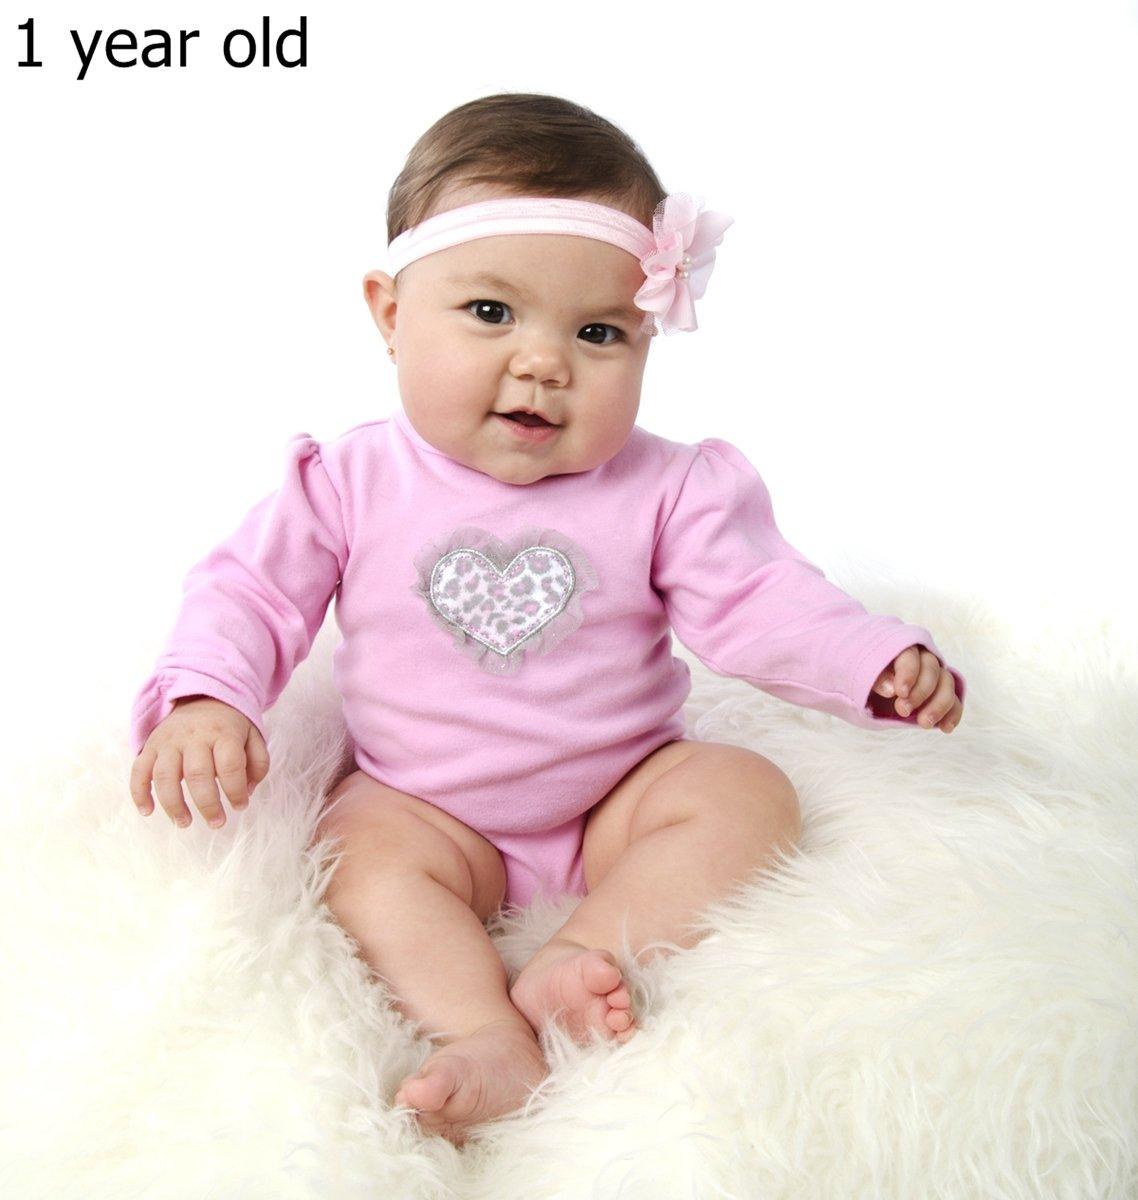 Fionas Hot Pink Ruffled Baby Girl Leggings and Headband Gift Set